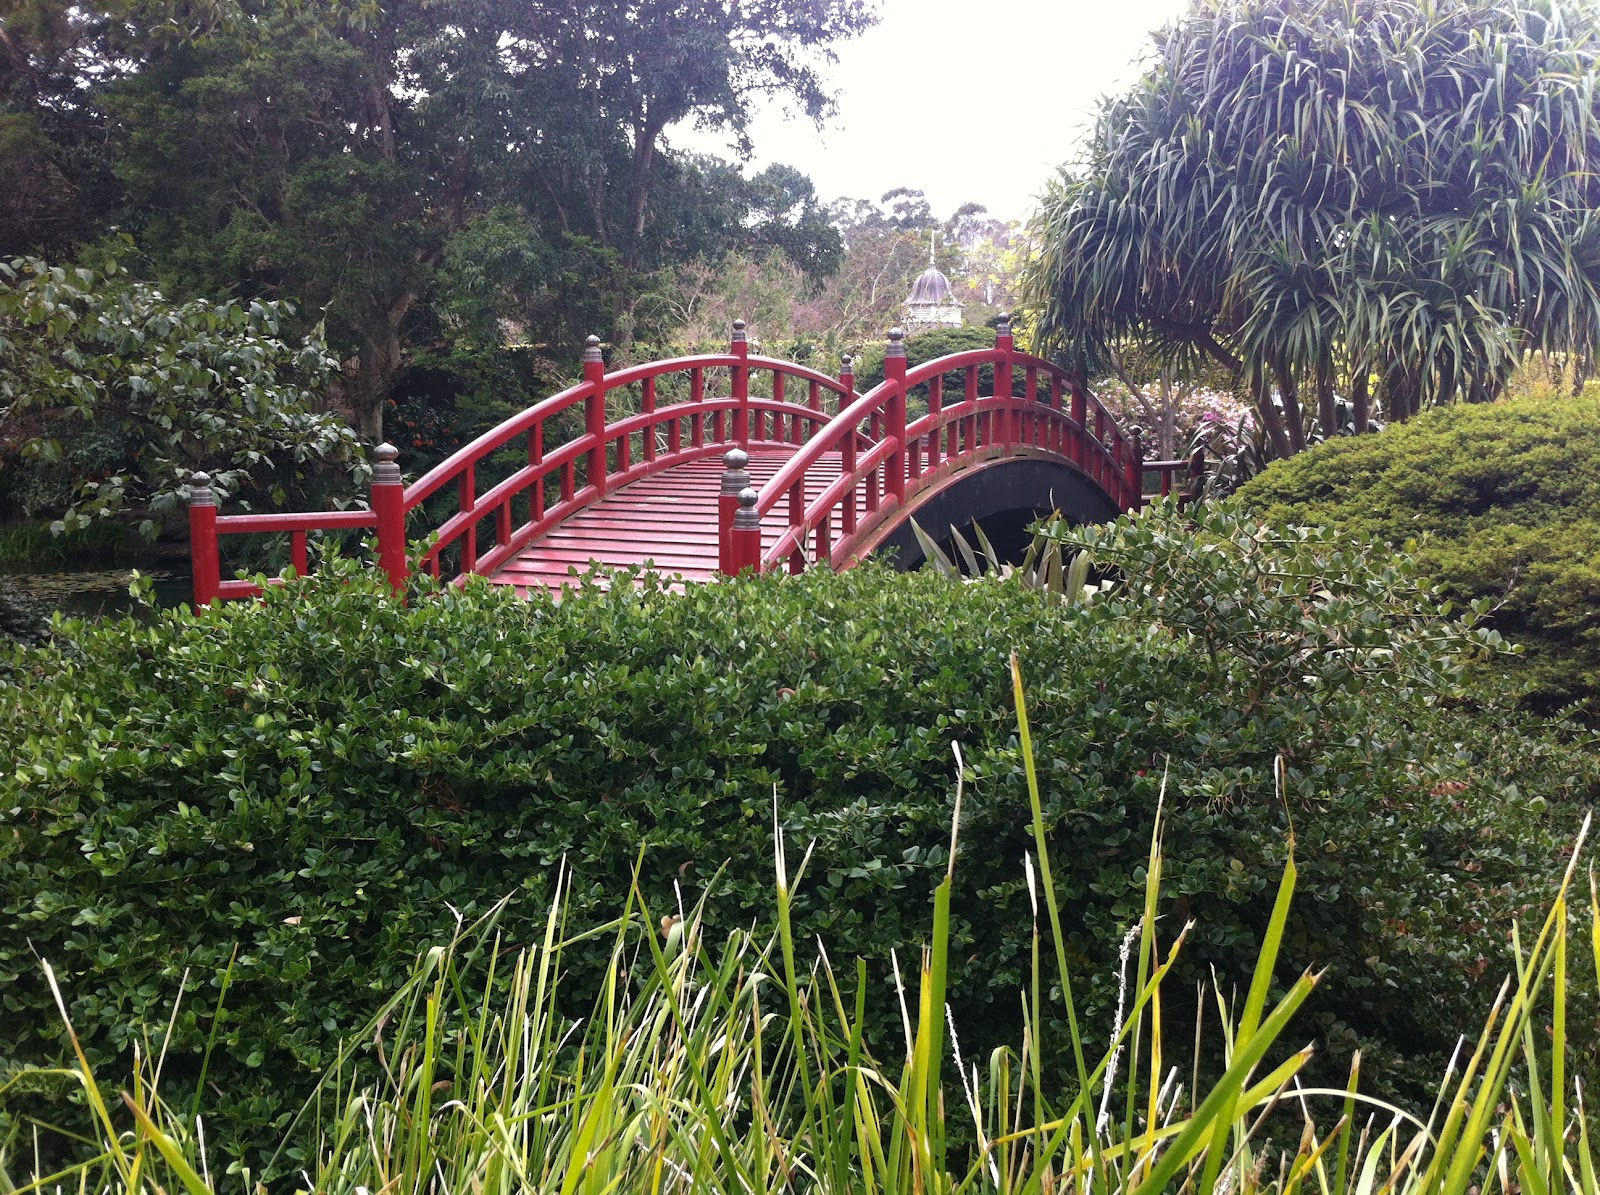 botanical gardens nsw wollongong owen wilson photography